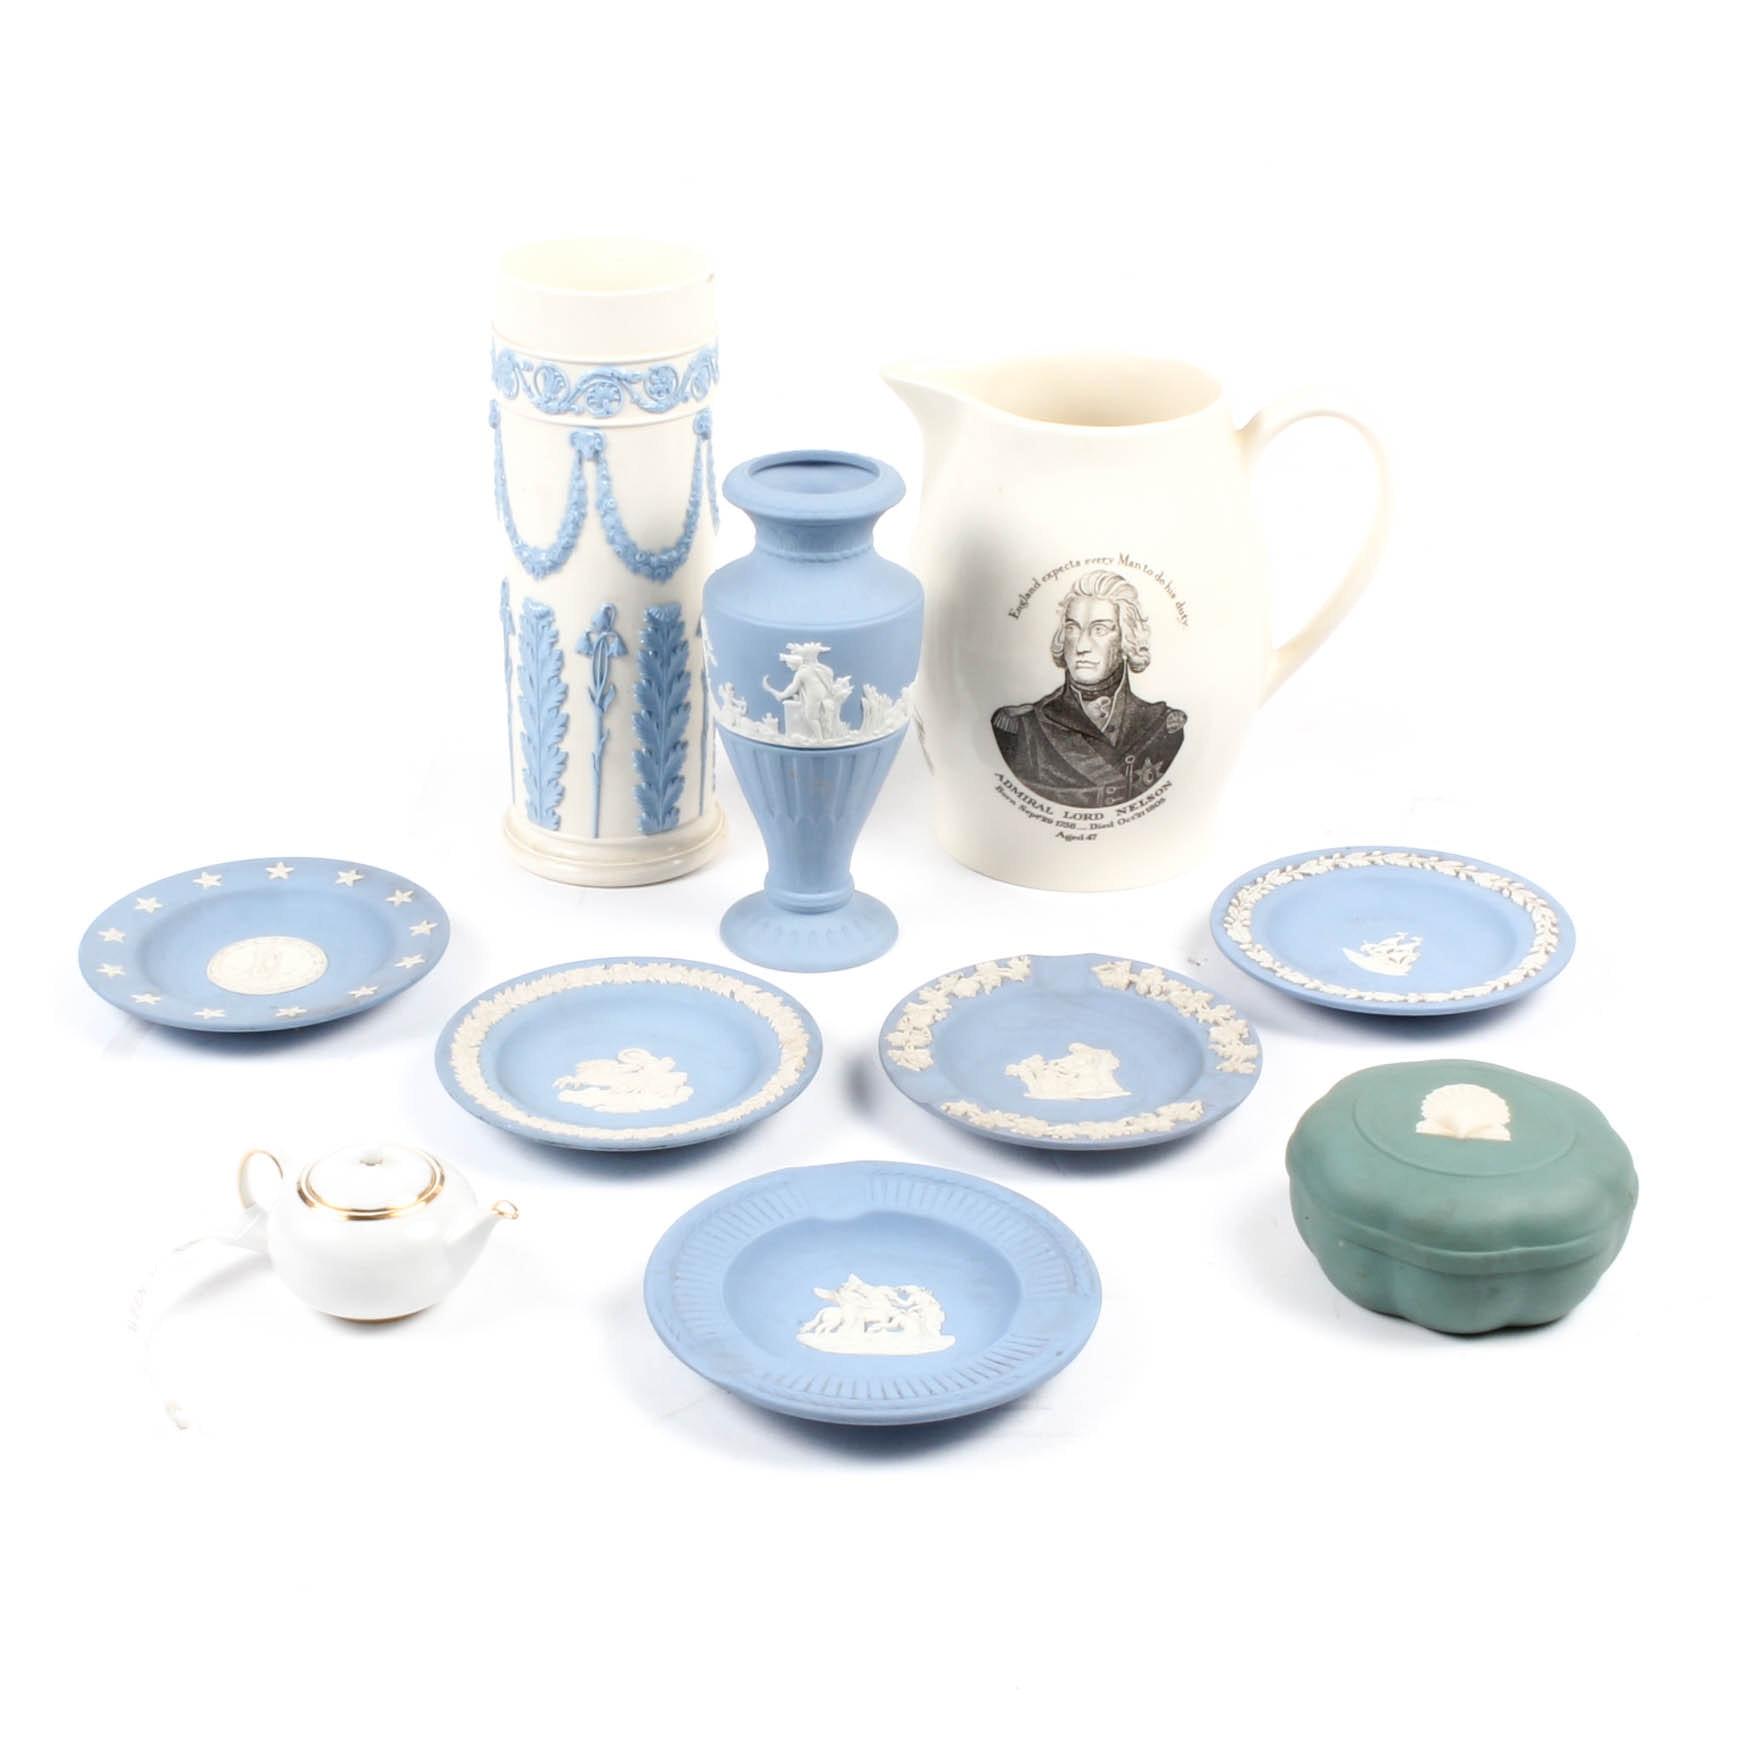 Wedgwood Porcelain and Jasperware Assortment